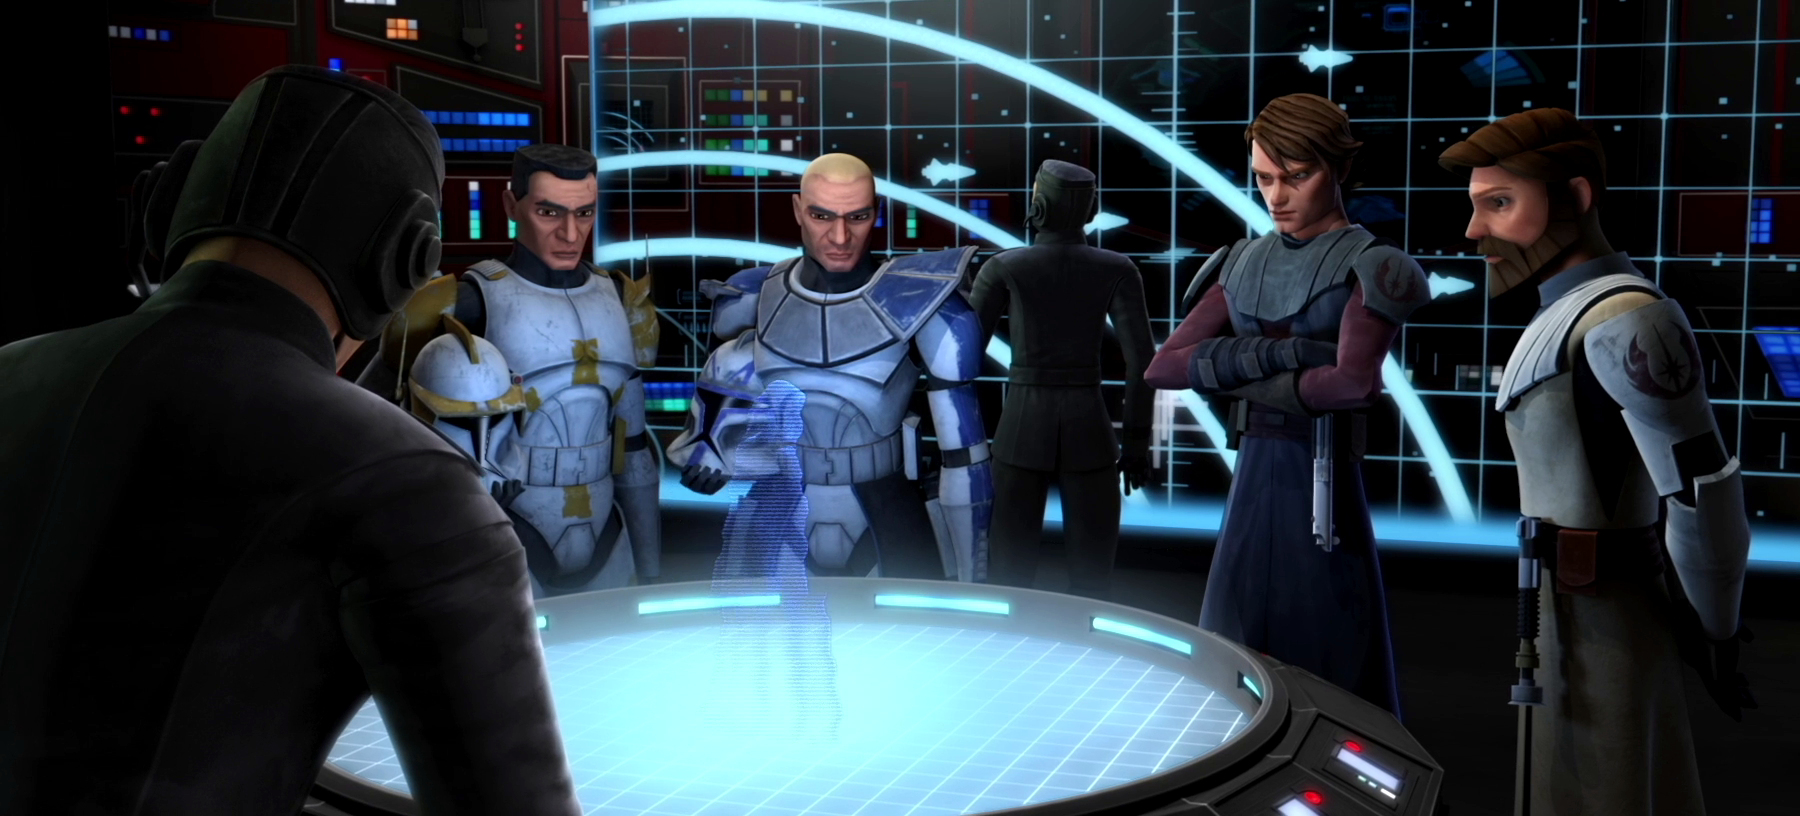 JediClonesMeeting-ARC.png